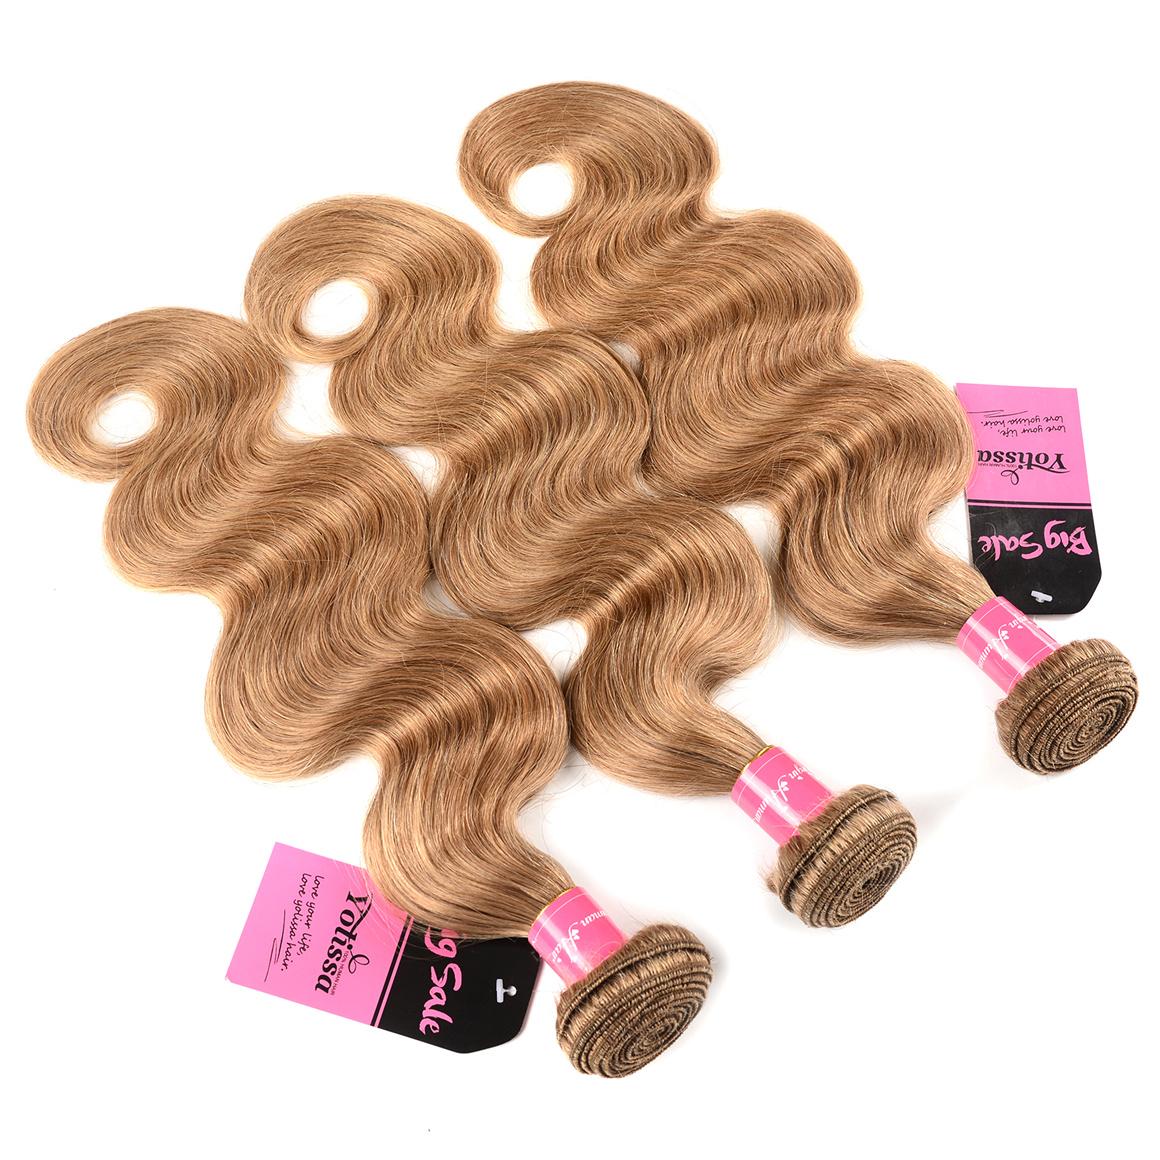 3 Bundles With Frontal Honey Blonde Color